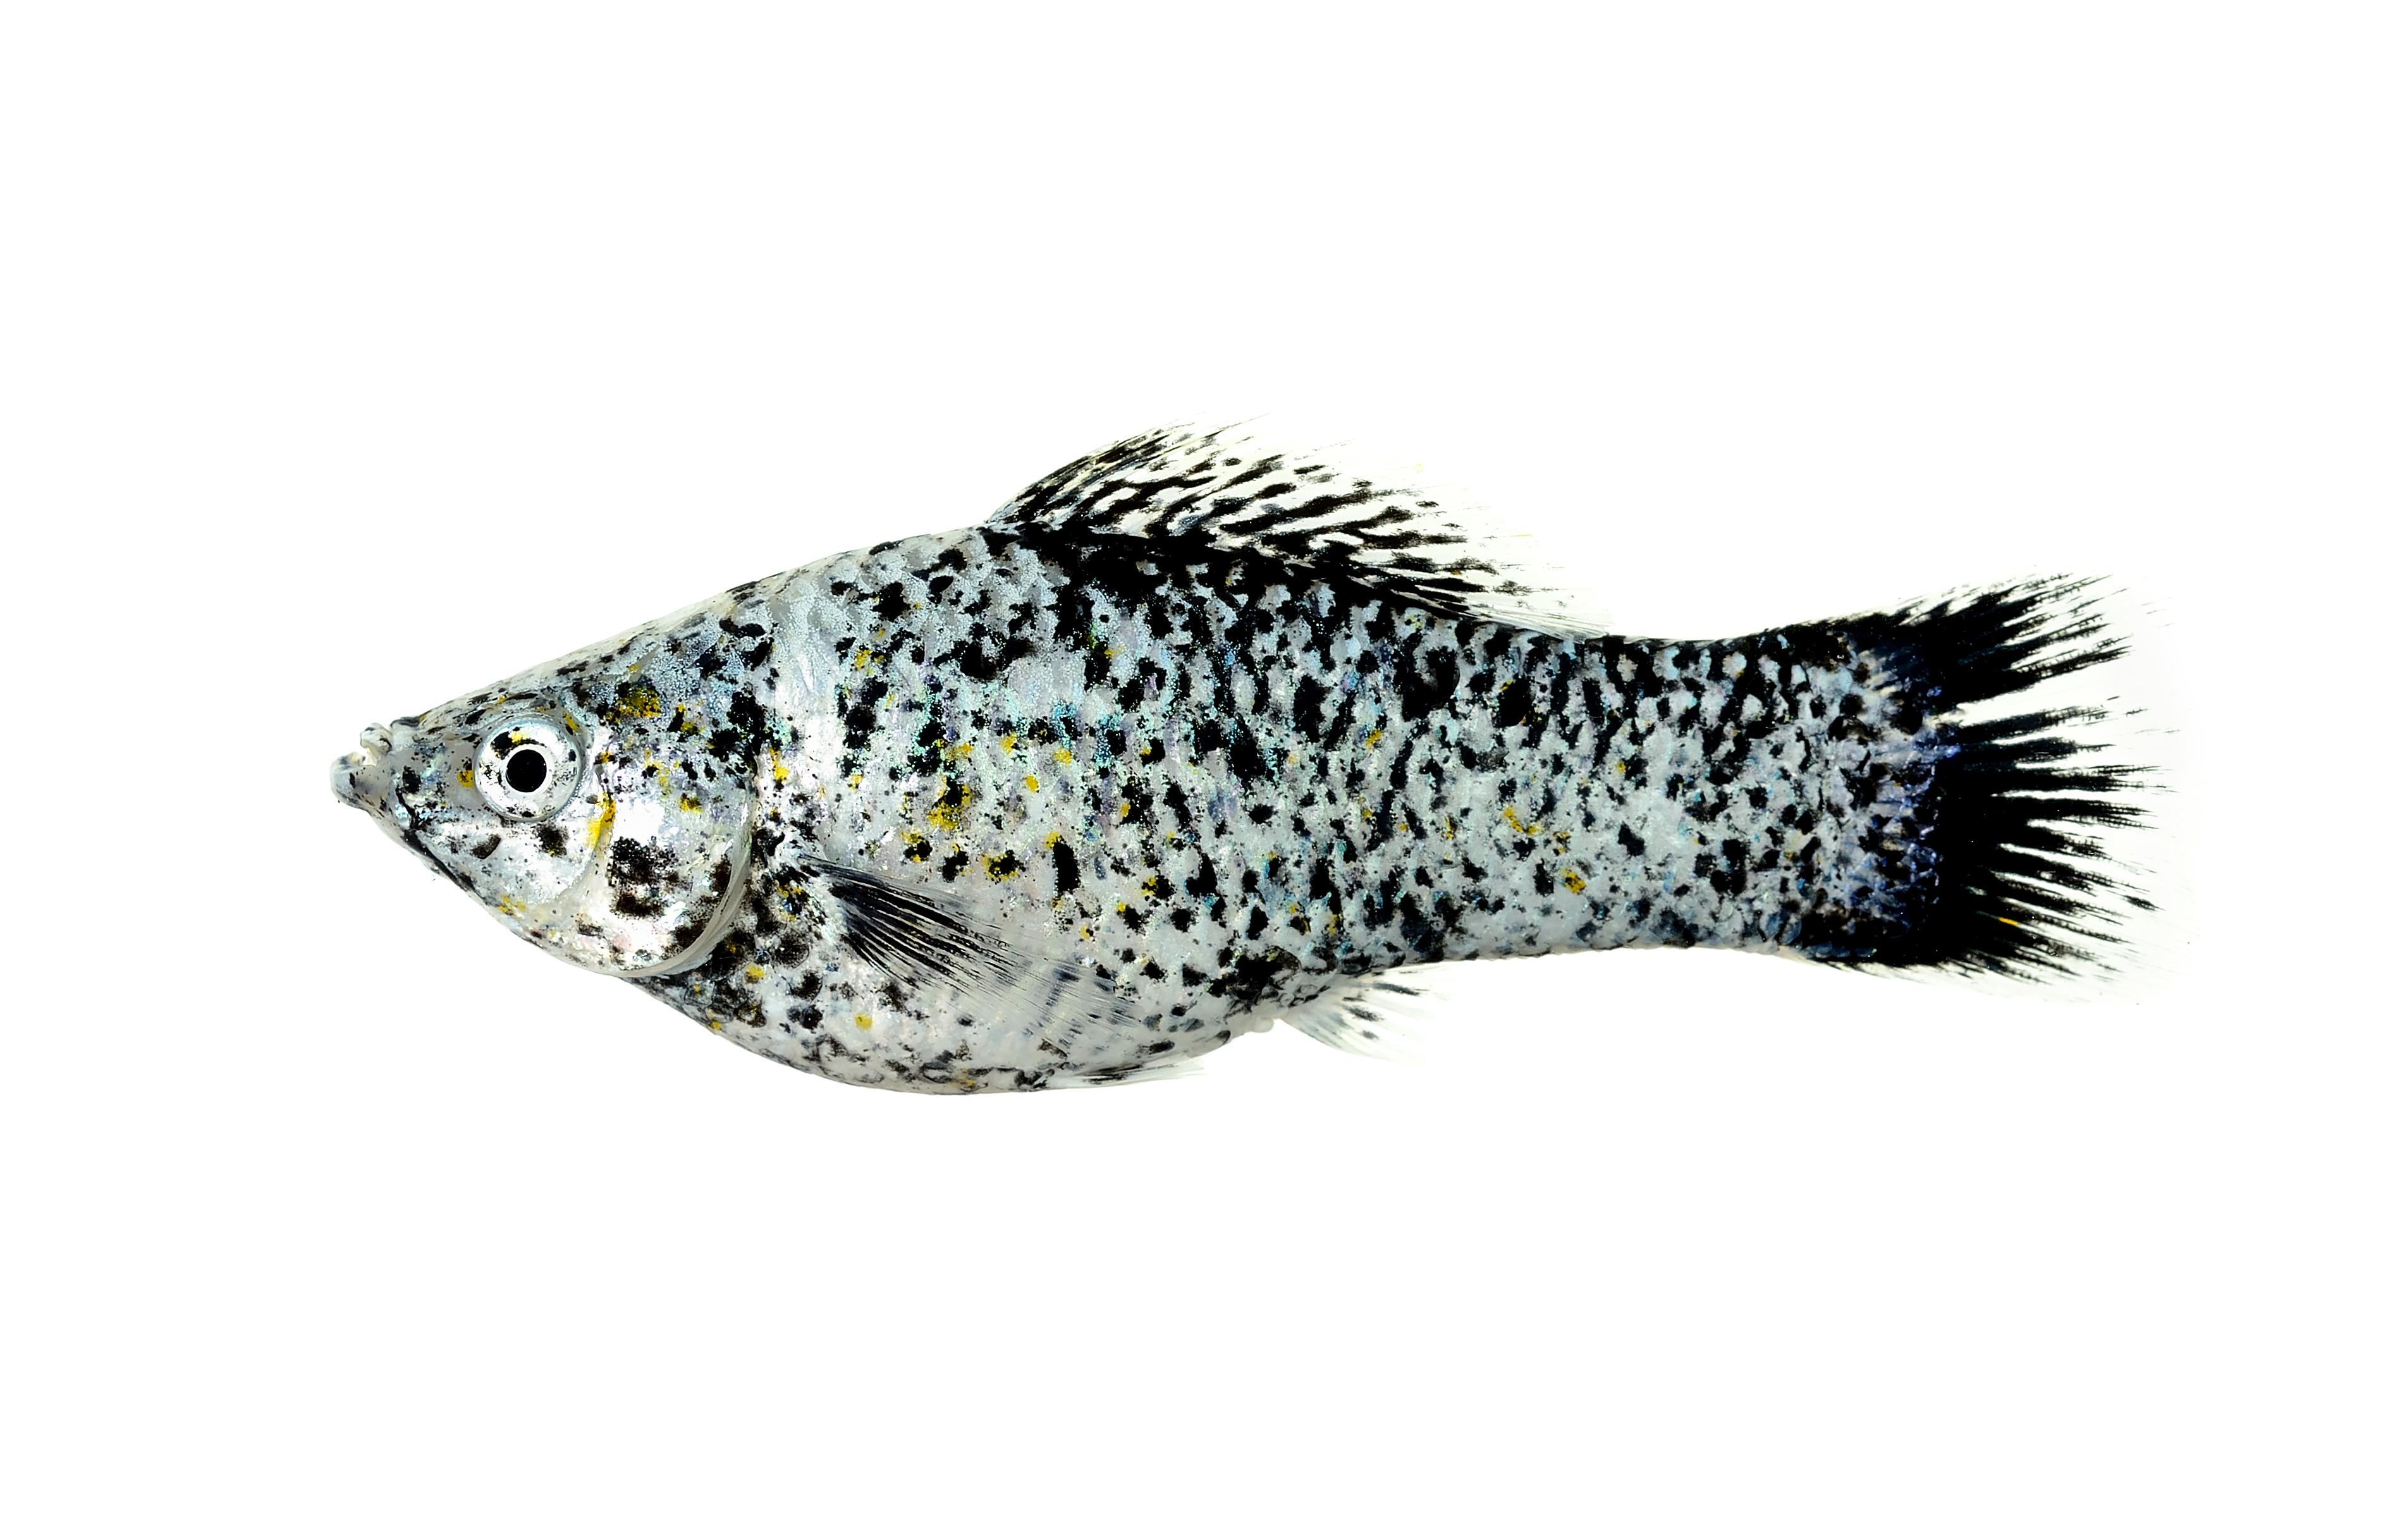 Plenty of adult fish